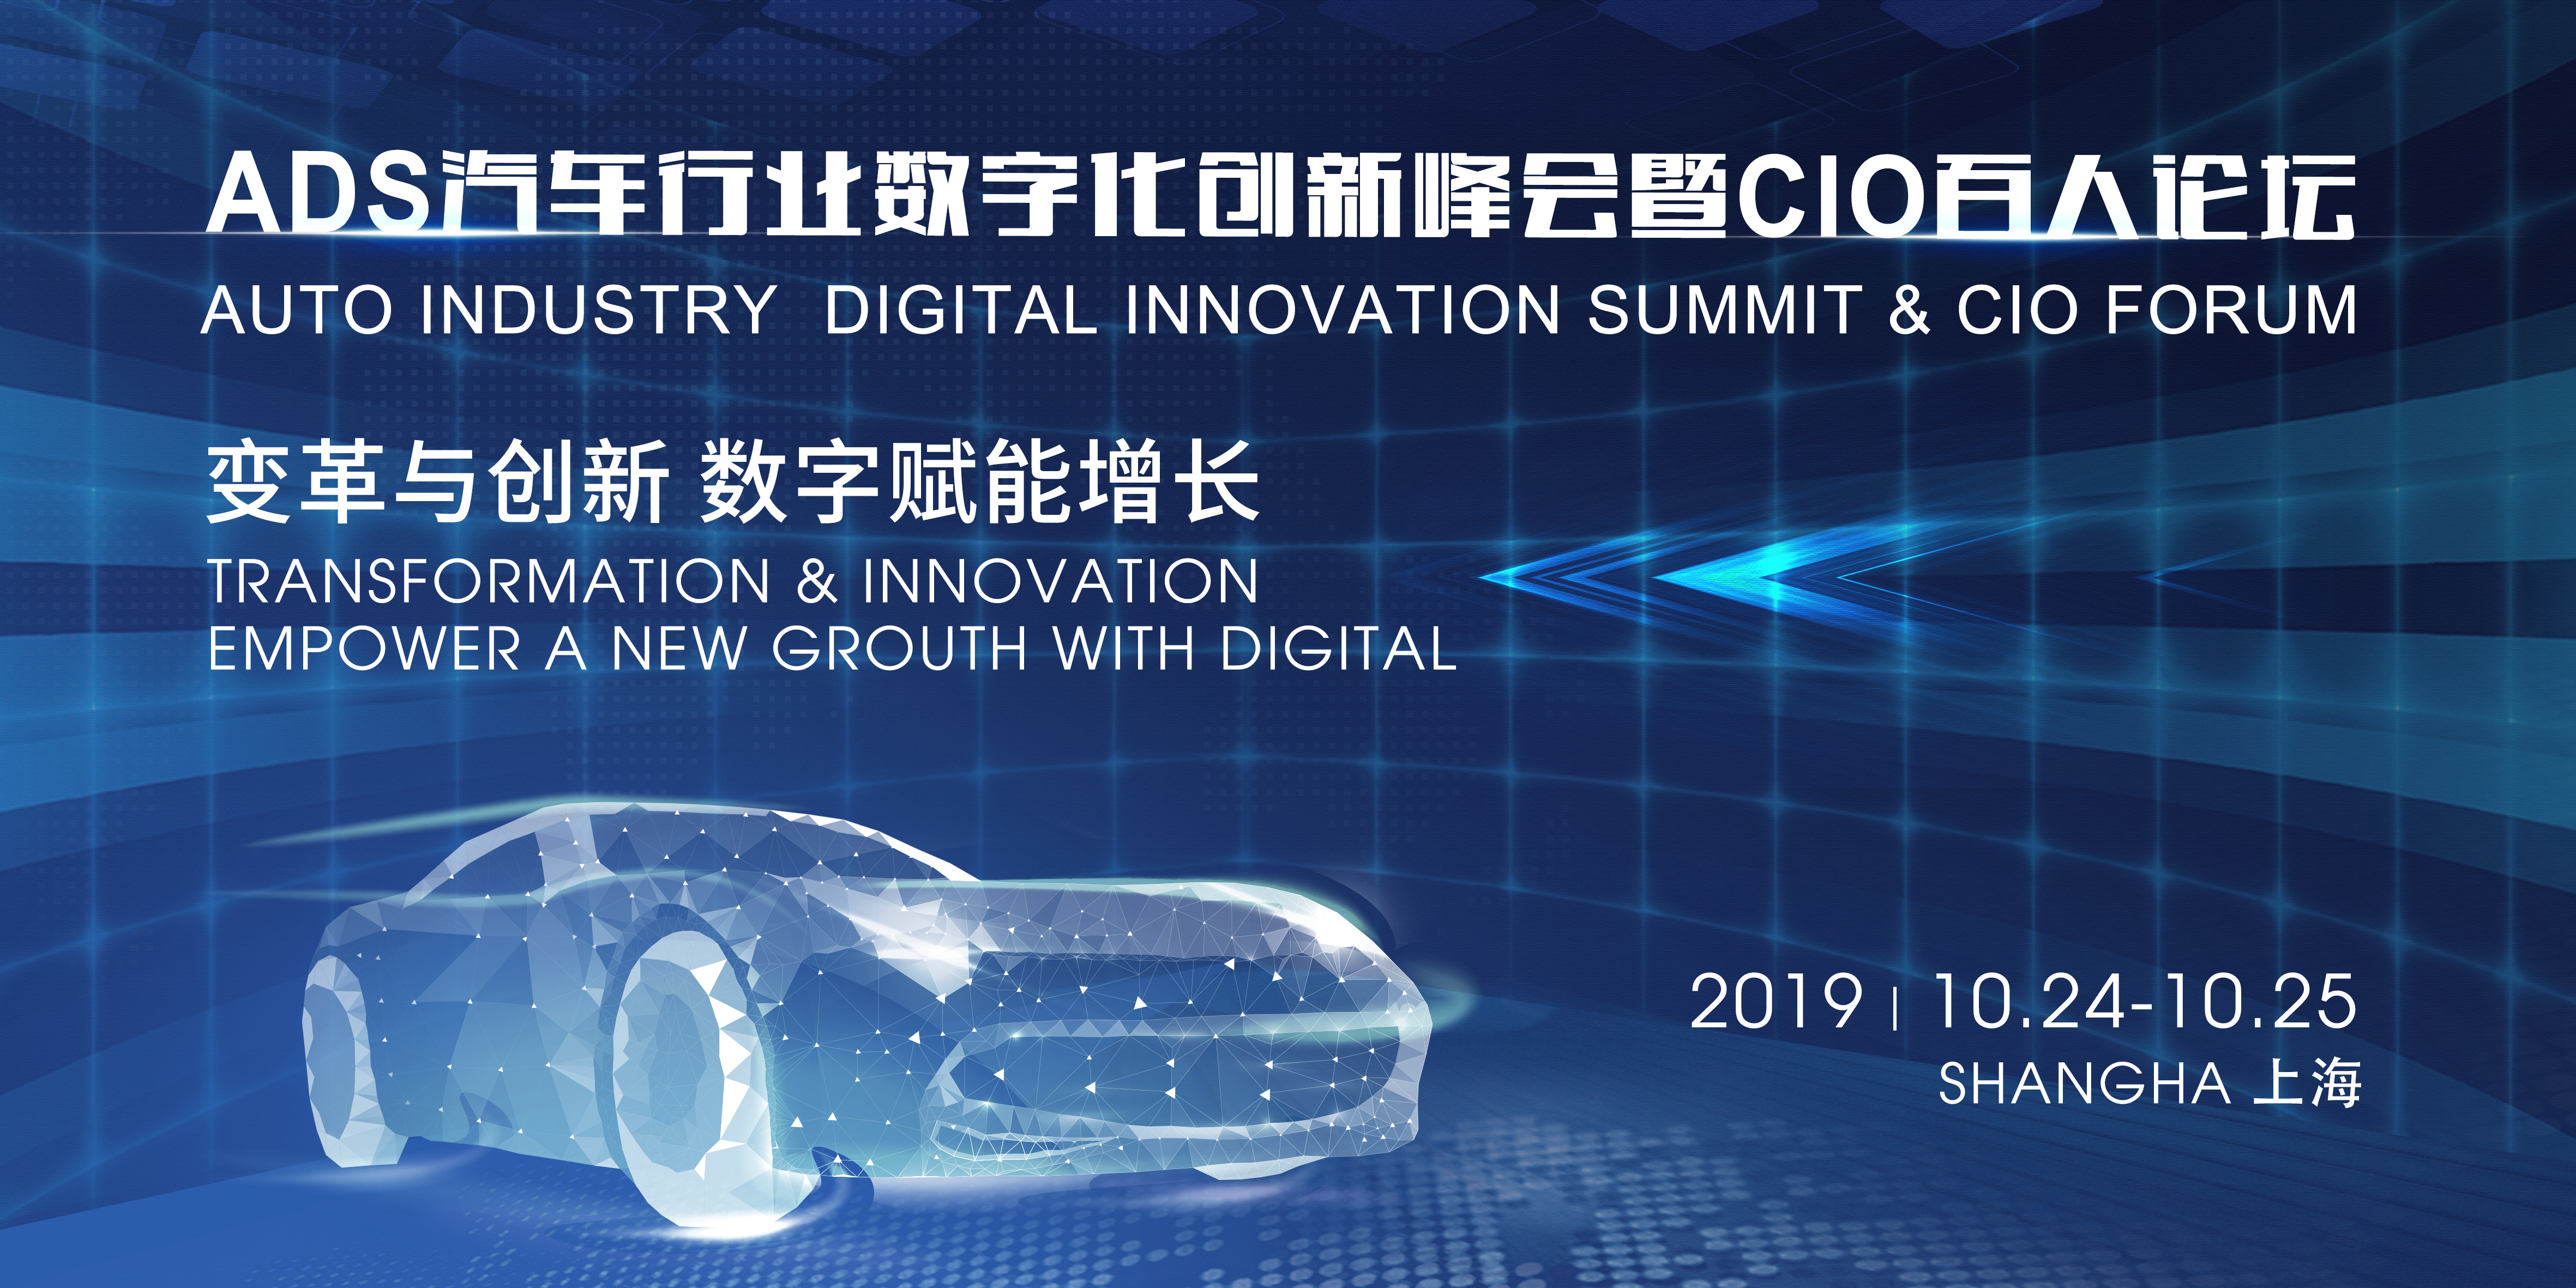 2019ADS汽车行业数字化创新峰会